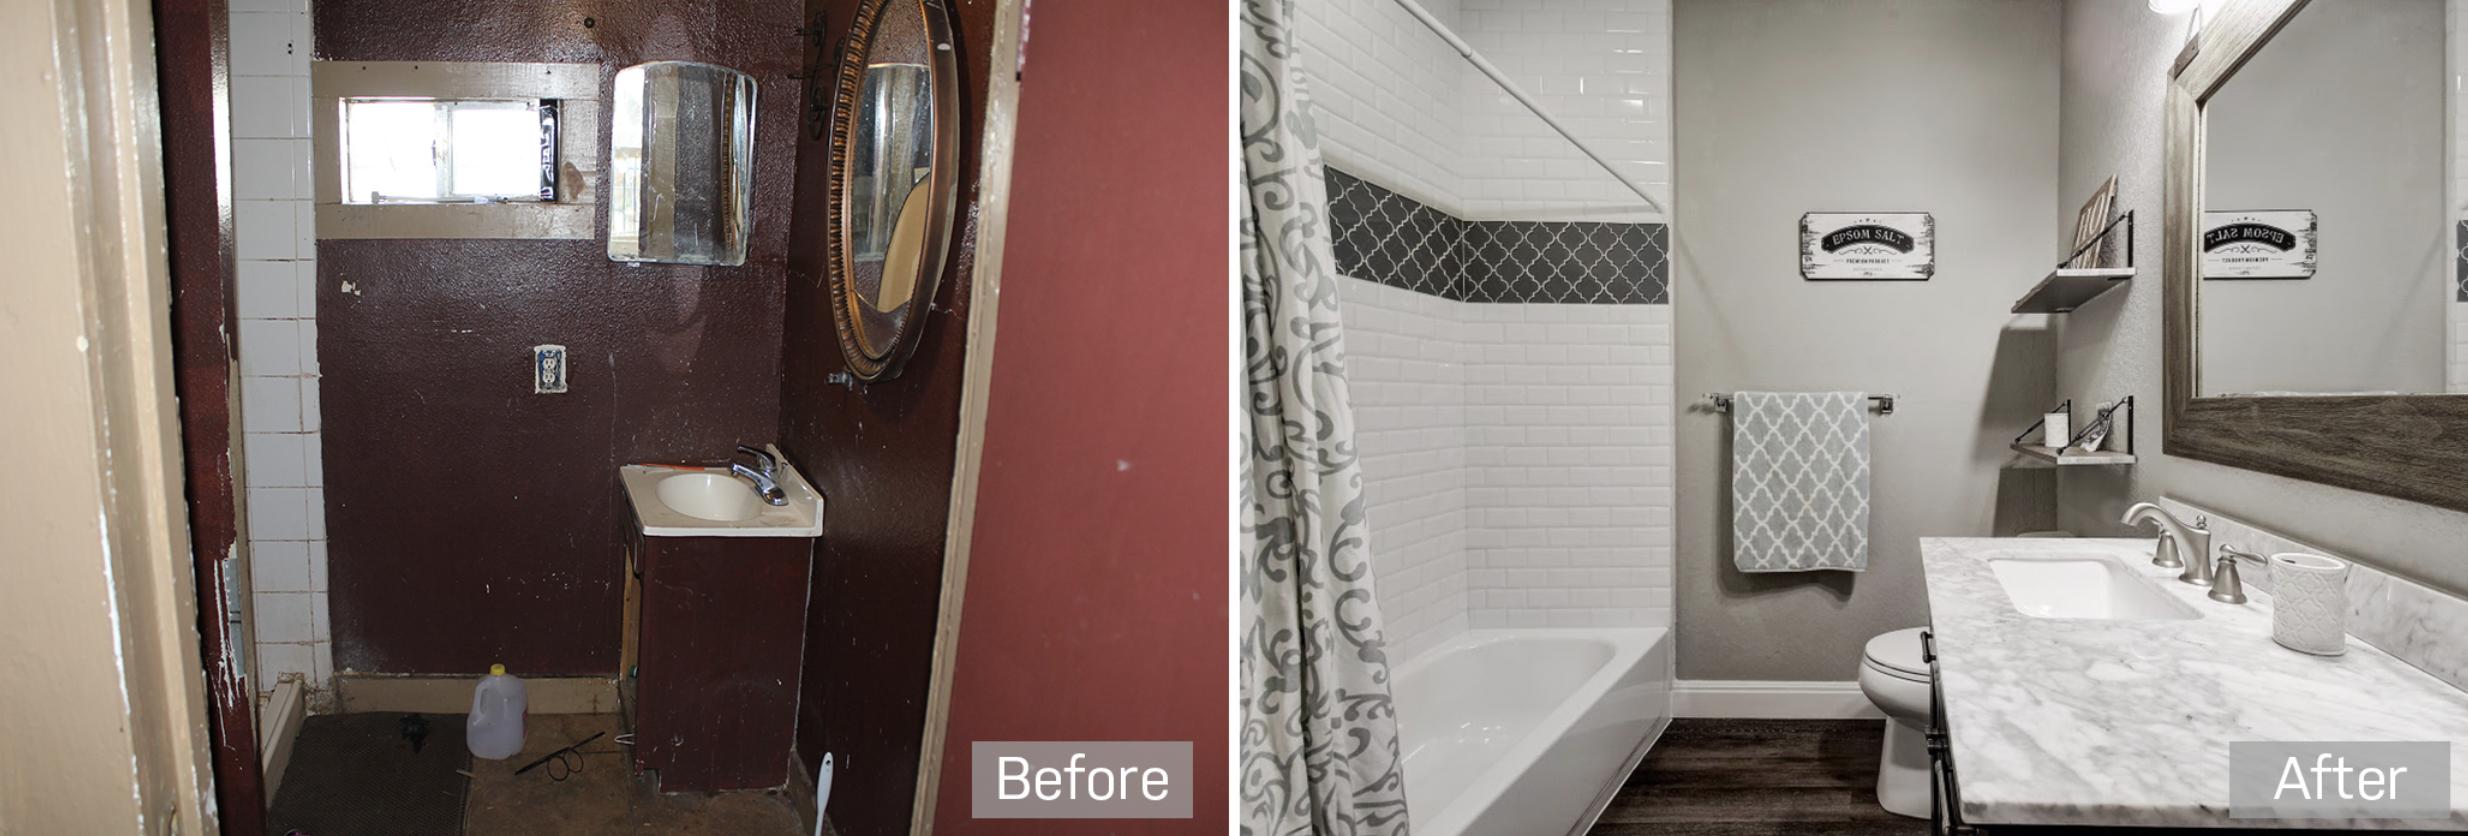 Bathroom Renovation Property Management San Antonio.png